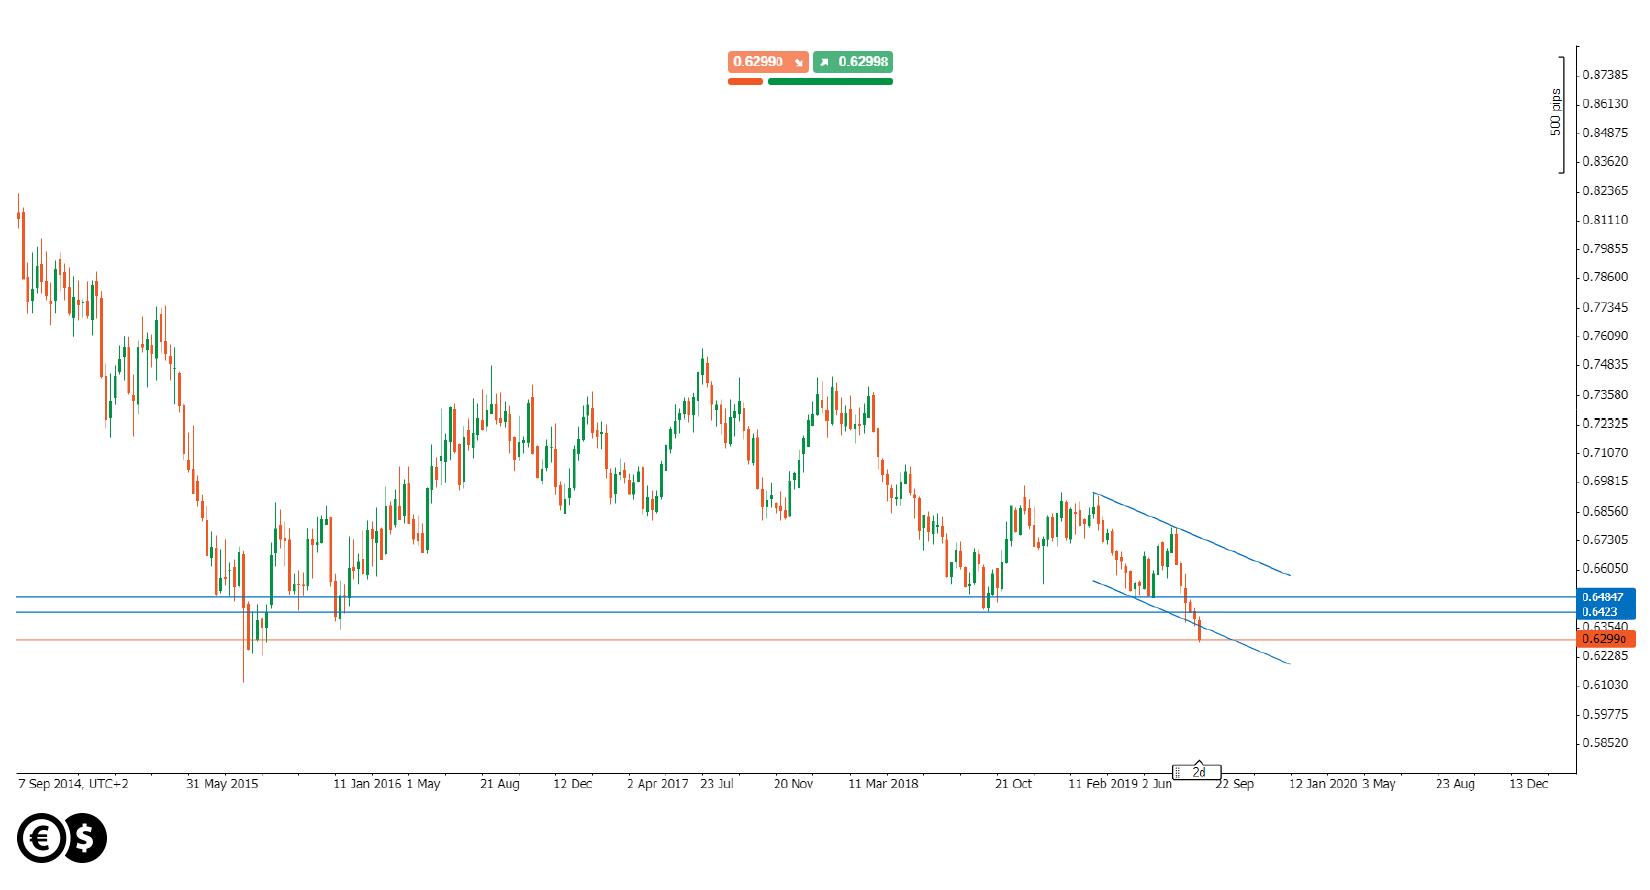 NZD/USD weekly chart